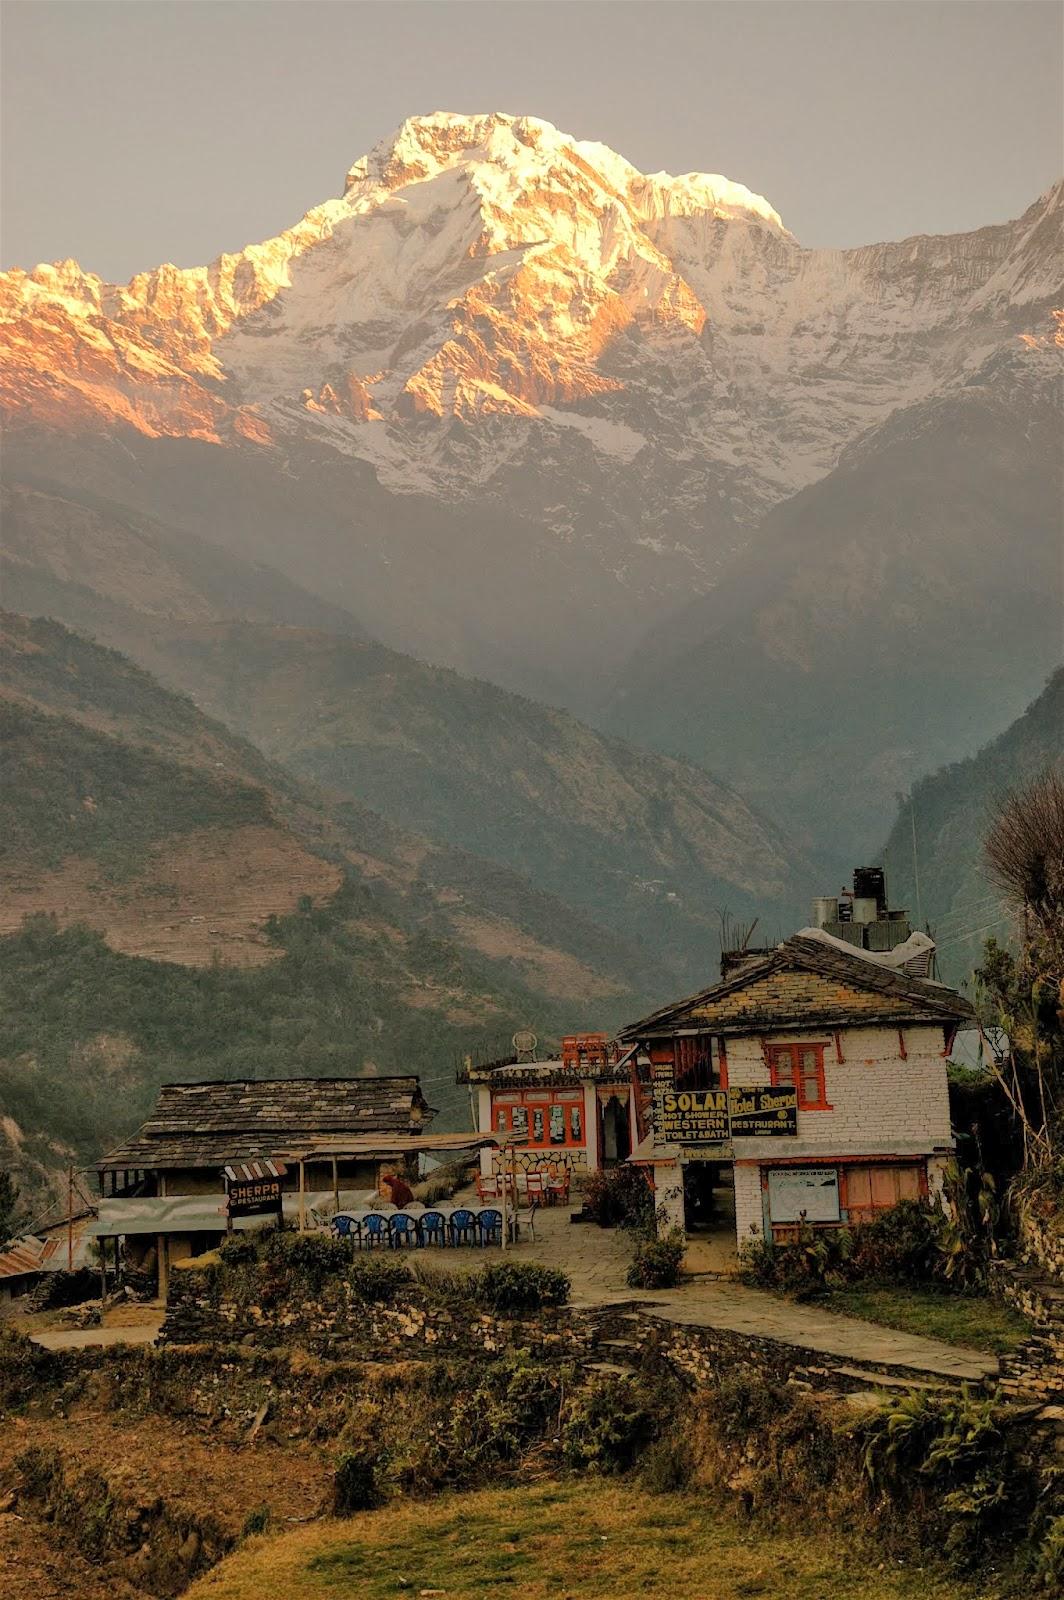 Landruk, Nepal 2008